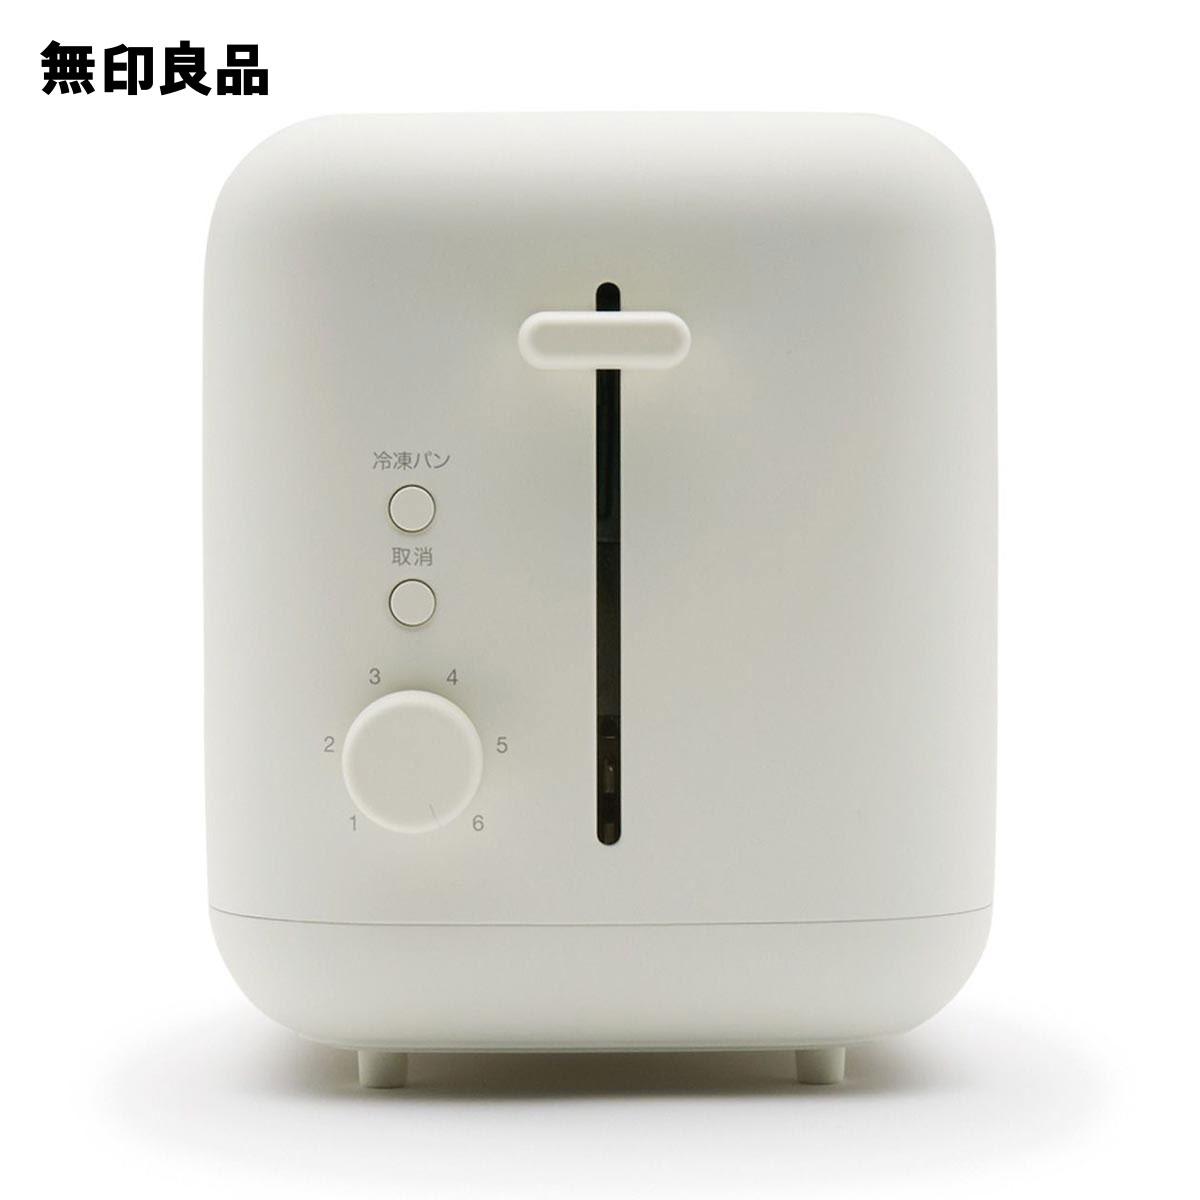 https://thumbnail.image.rakuten.co.jp/@0_mall/mujirushi-ryohin/cabinet/item05/4547315236732.jpg